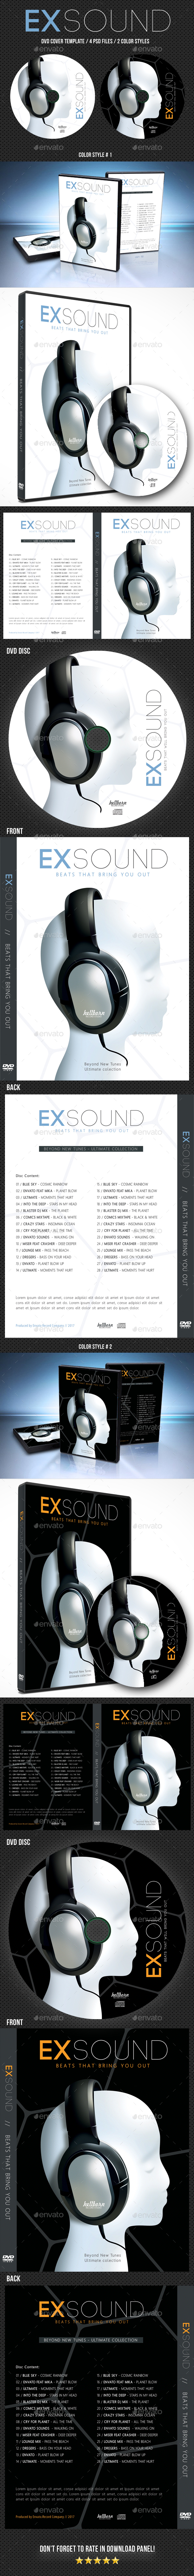 Exsound DVD Cover Template V3 - CD & DVD Artwork Print Templates